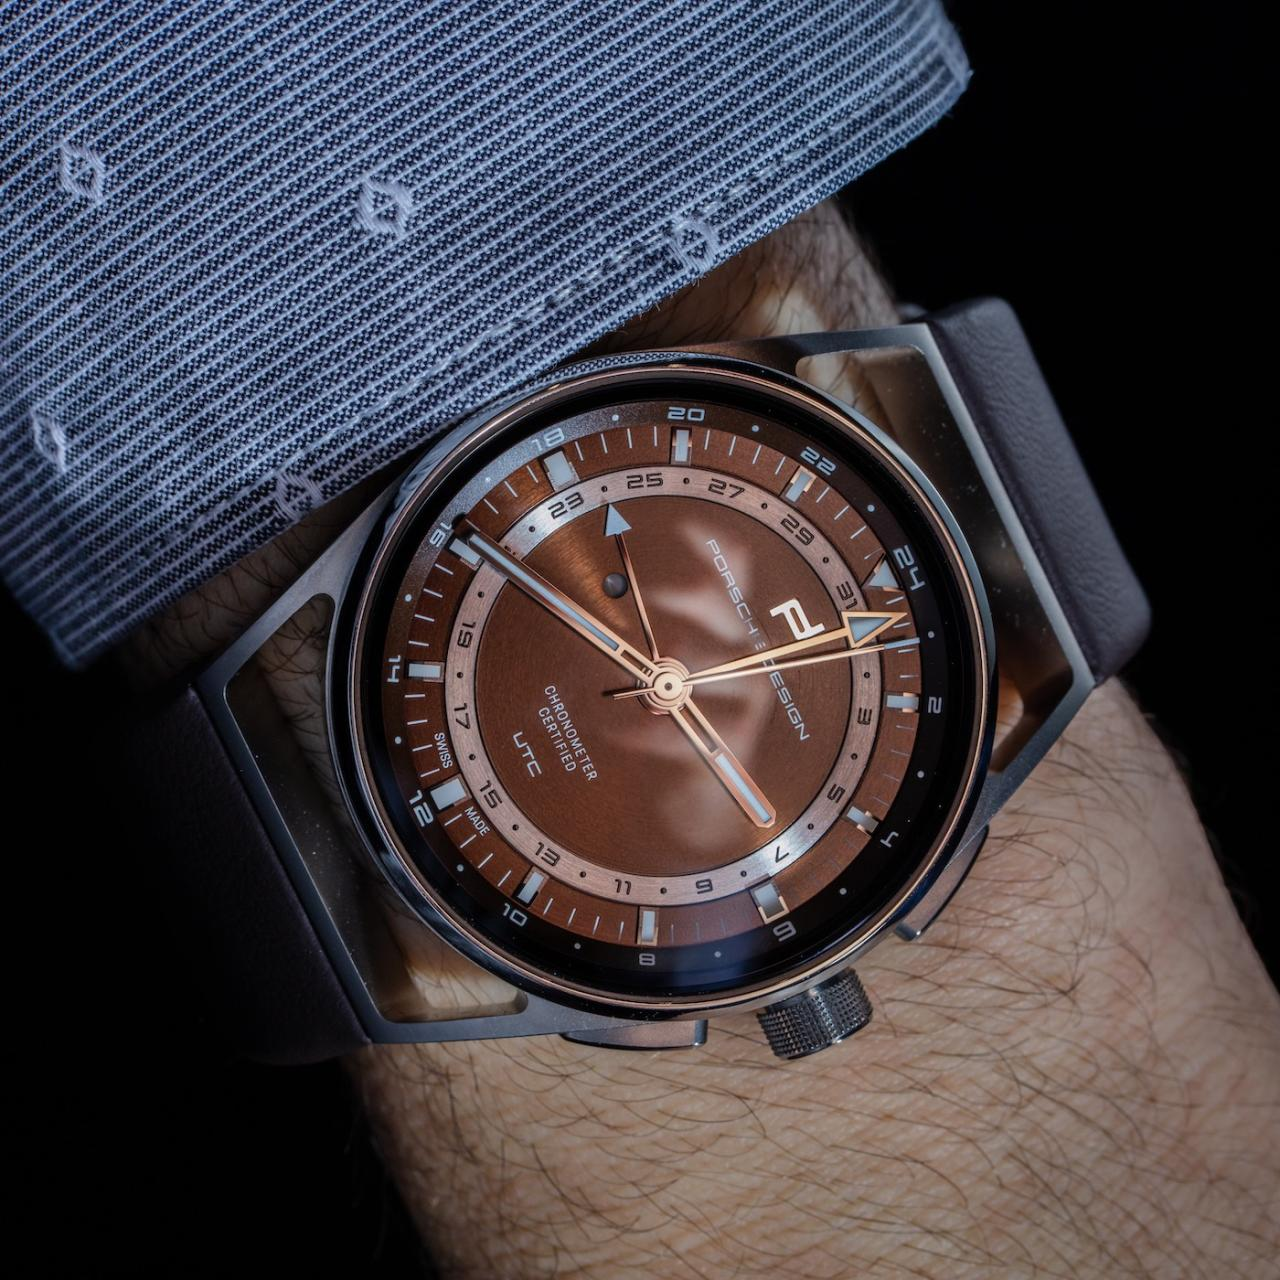 Porsche Design 1919 Globetimer UTC Replica Watches